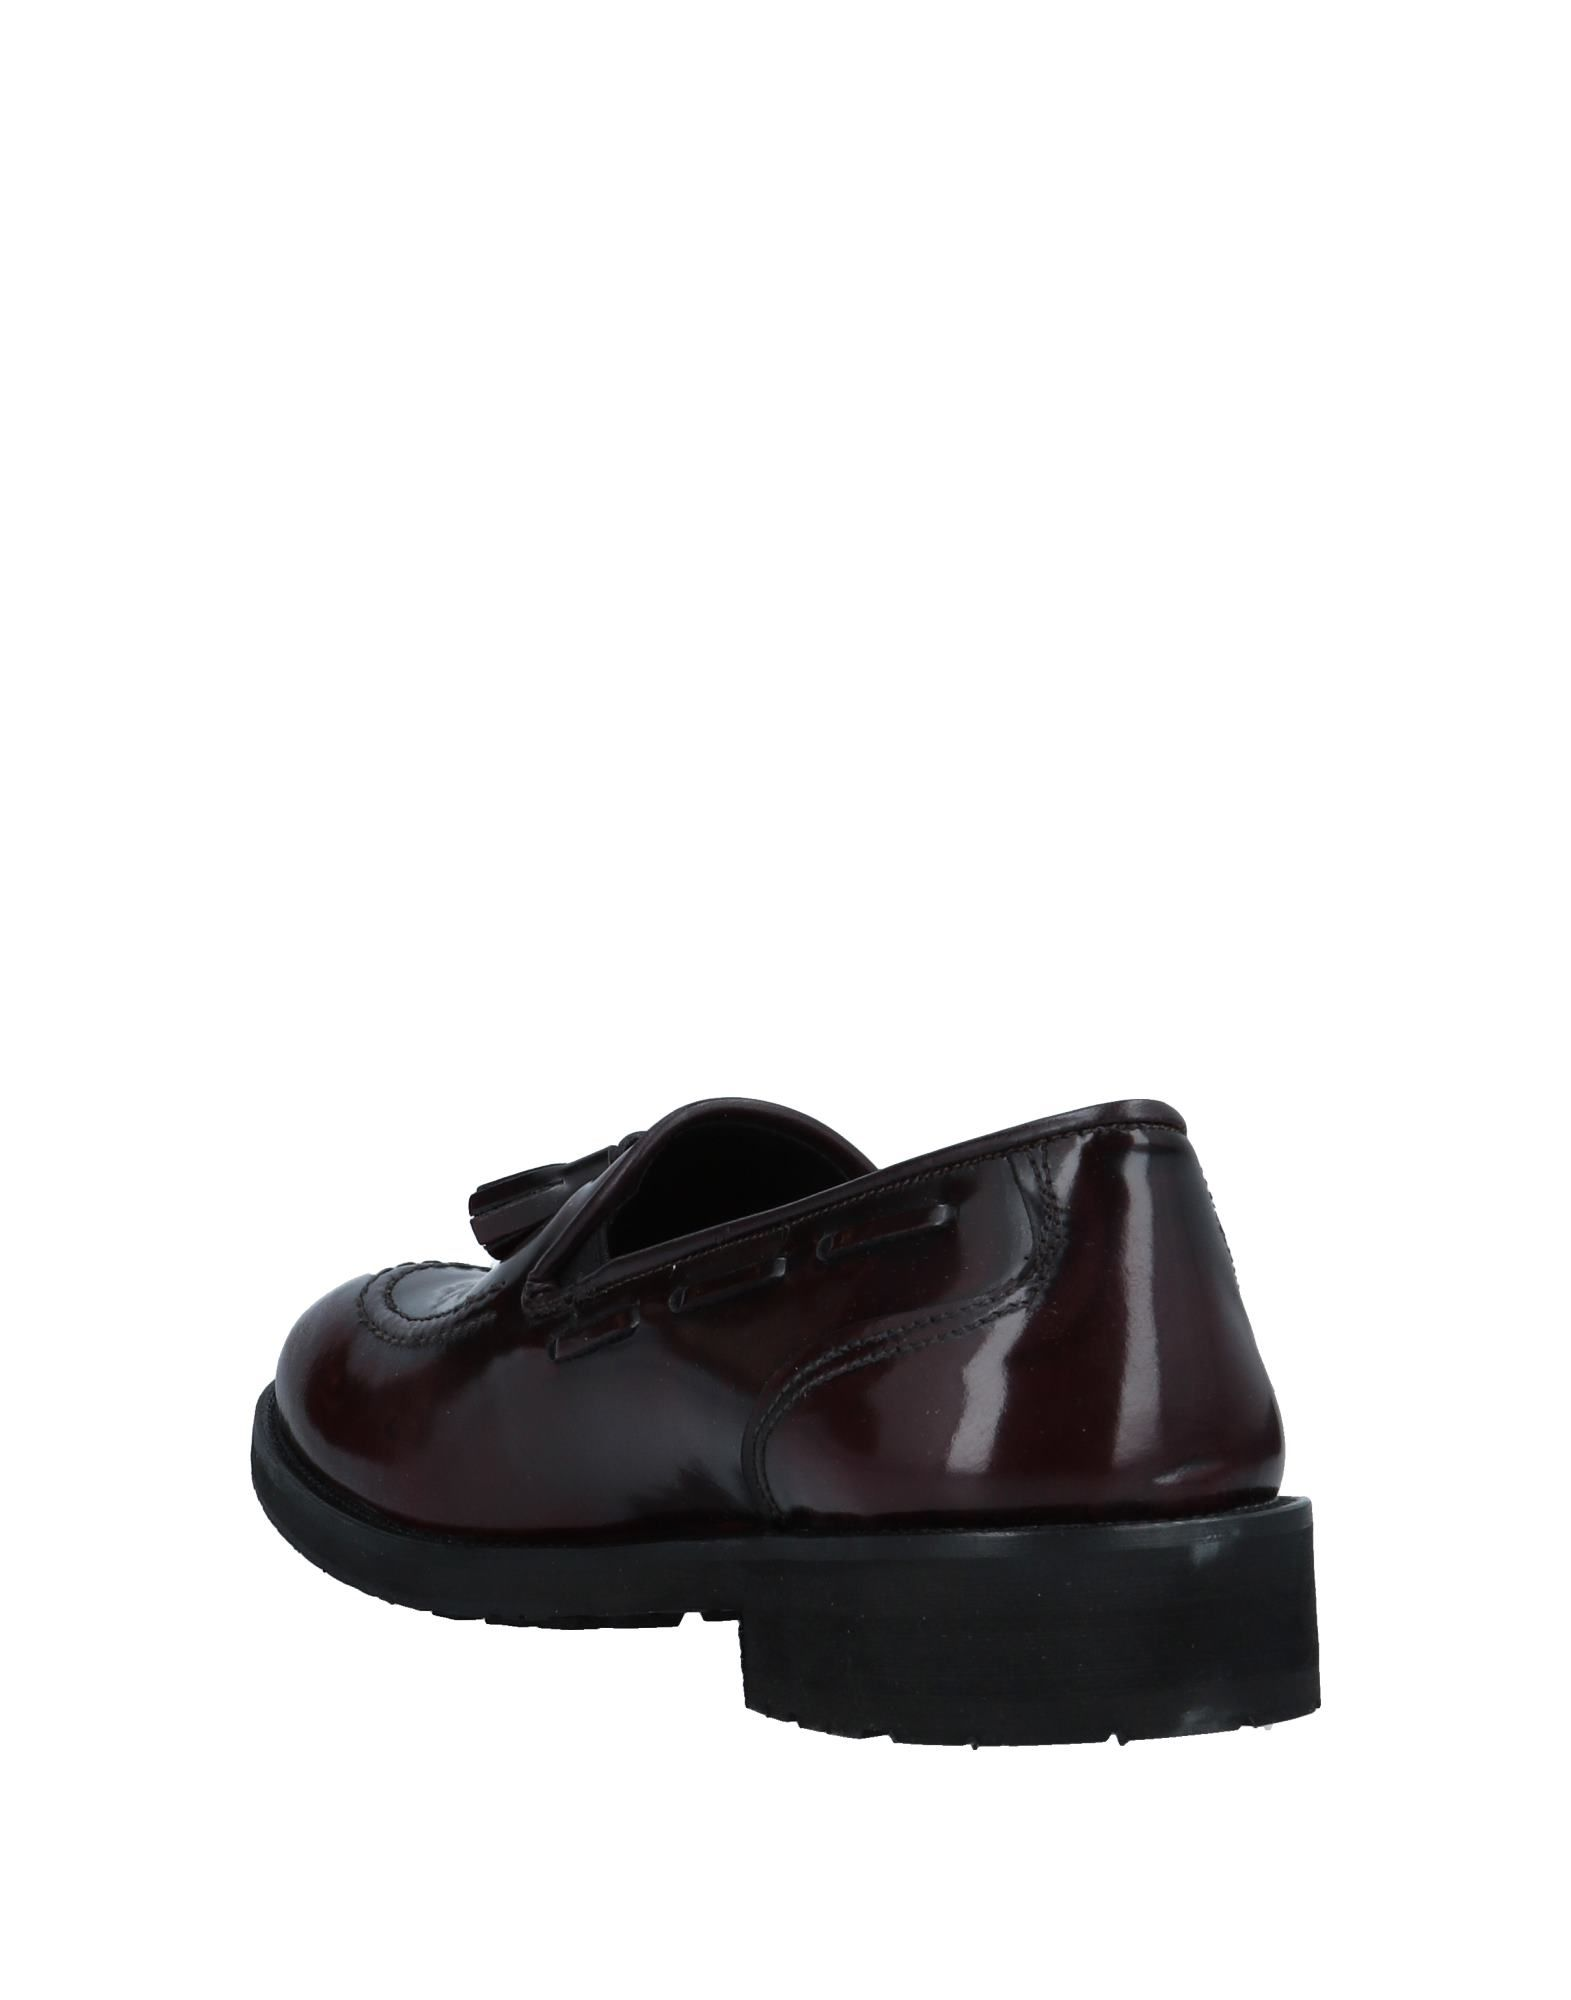 Rabatt Mokassins echte Schuhe Marc May Mokassins Rabatt Herren  11247677UX 49d857